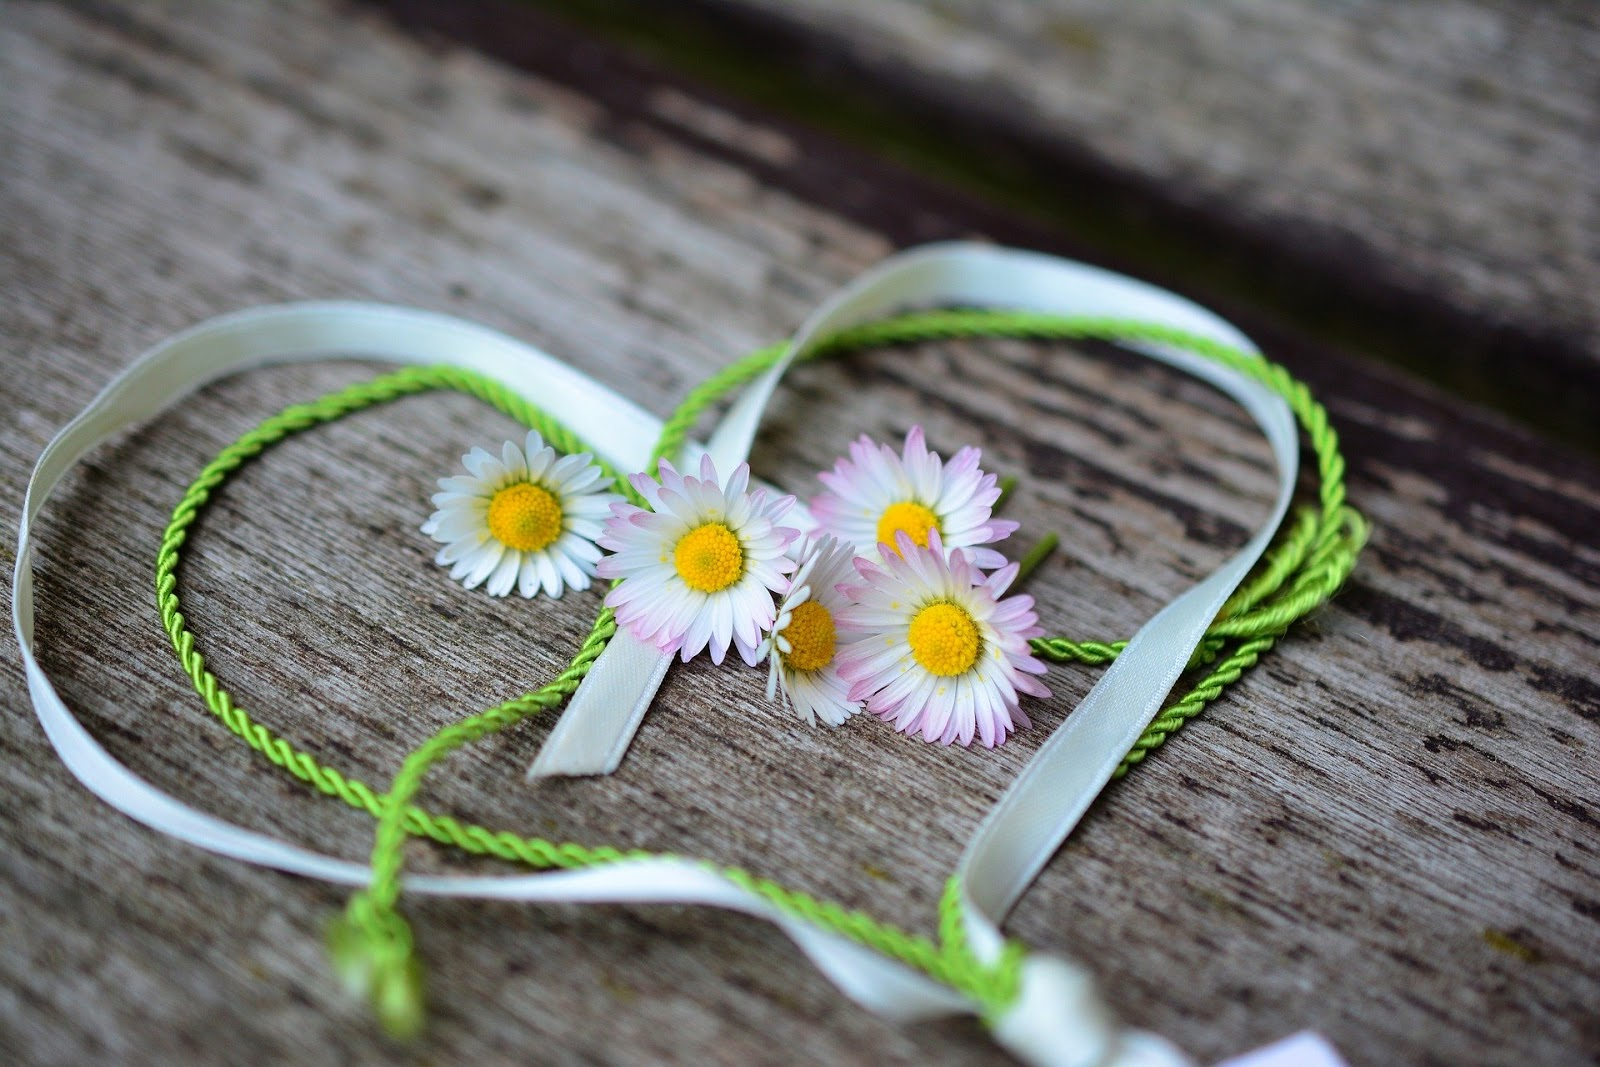 Daisy Heart Romance Valentine's Day Love Spring image